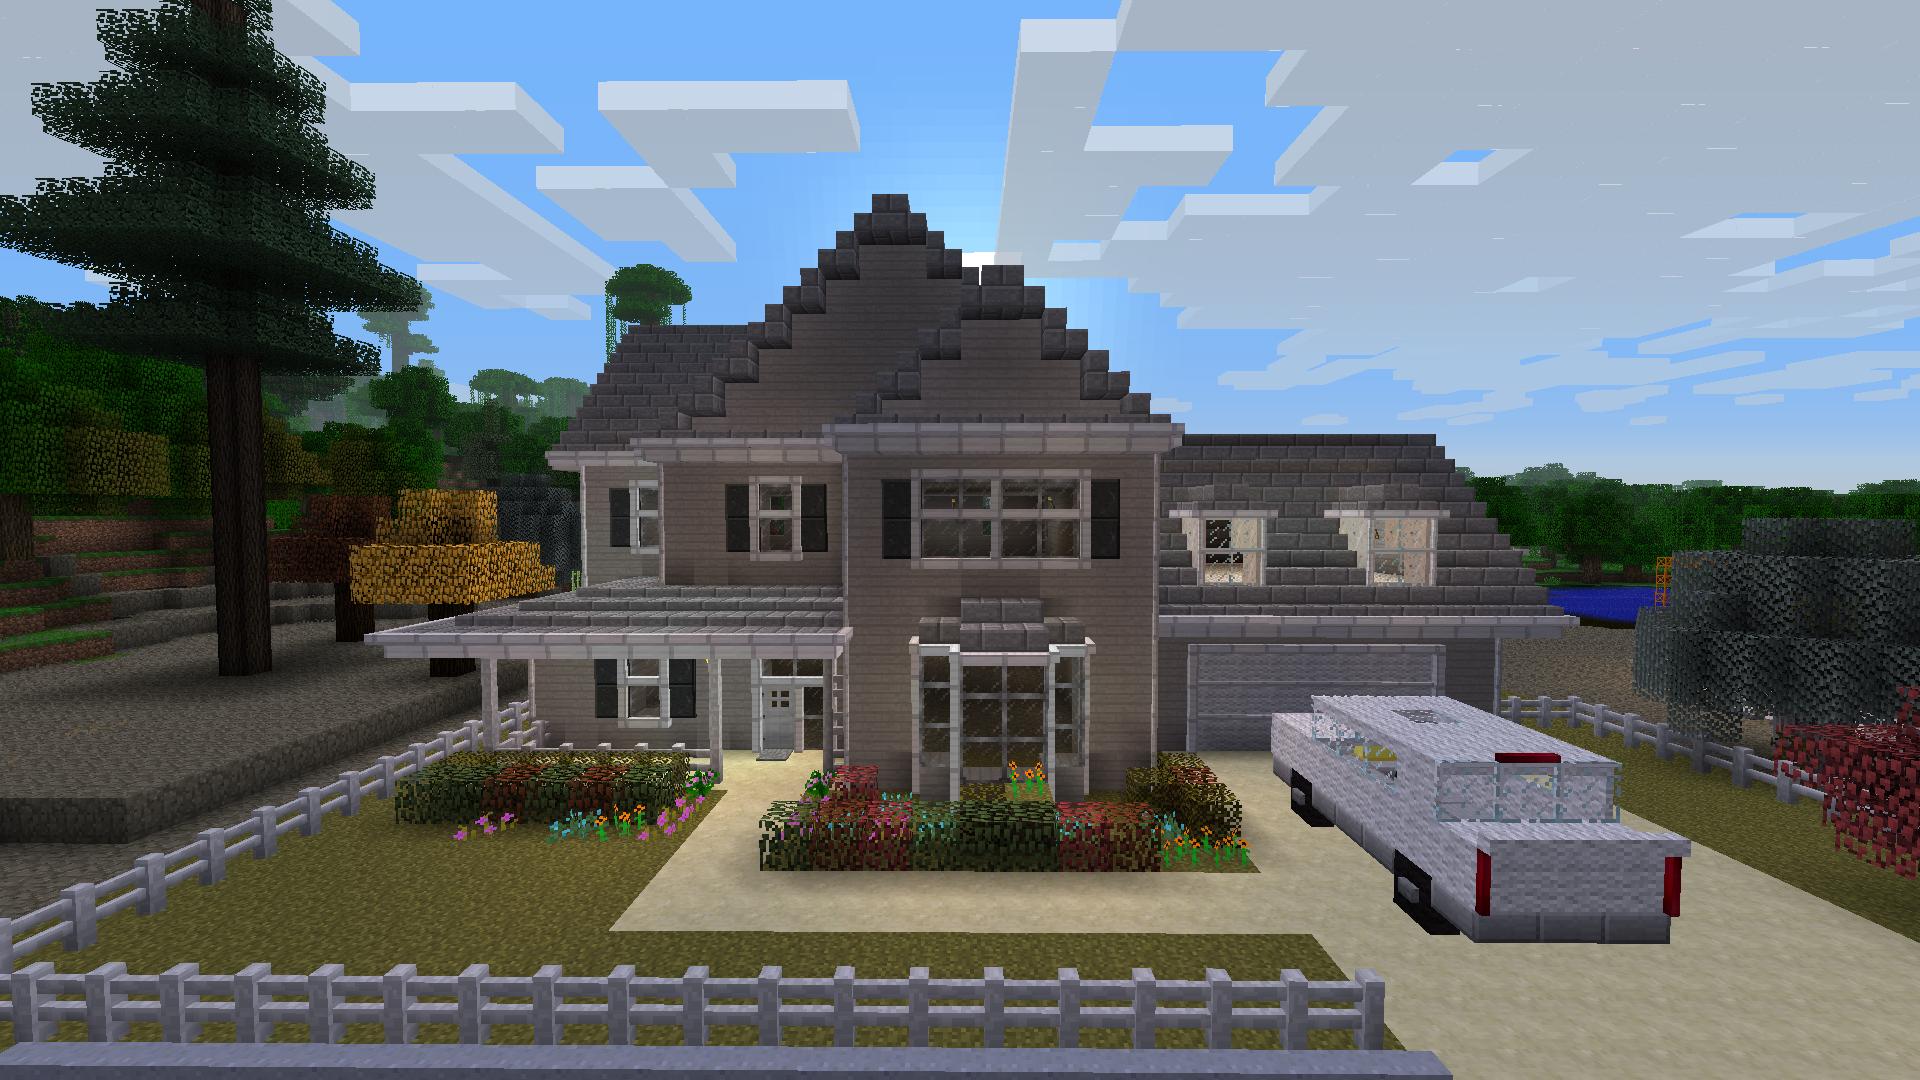 Popular Wallpaper Minecraft Houses - b84684da01c4b18a4bcb83b85d800fe3  Graphic_566476.png